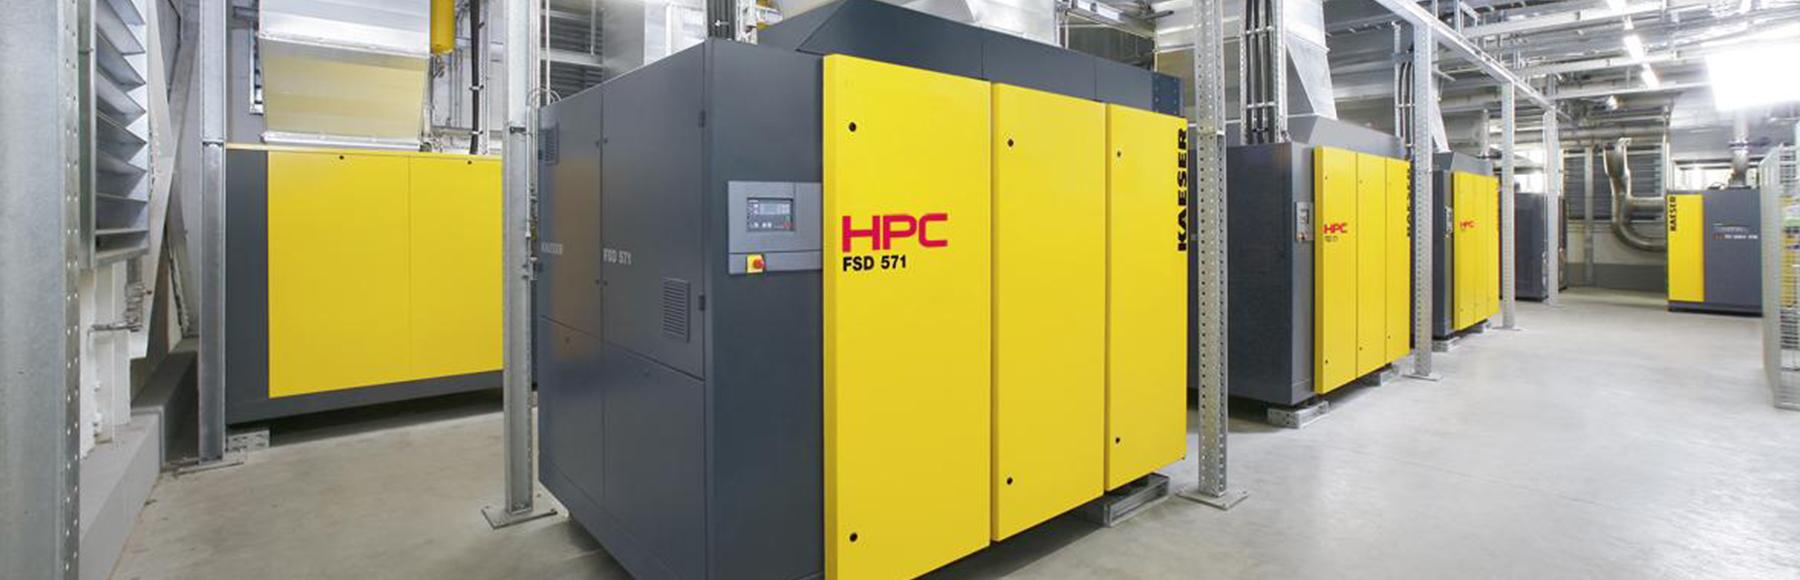 Compressor Systems